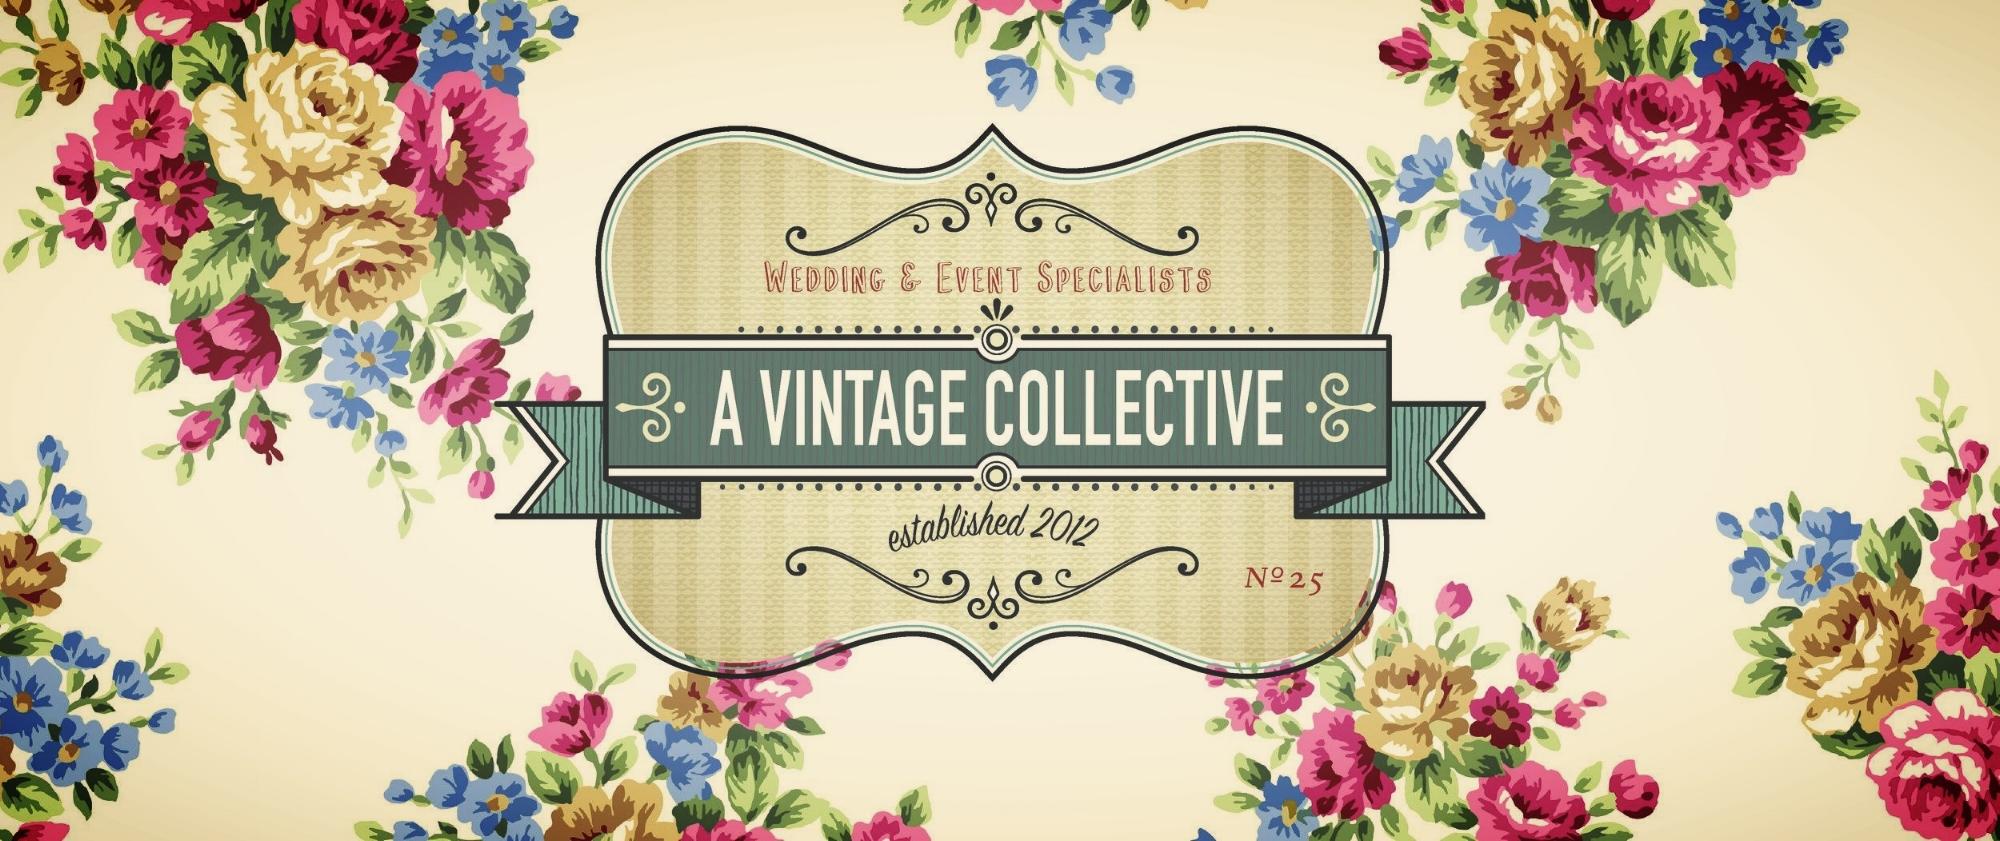 A vintage collective facebook-01[12393].jpg